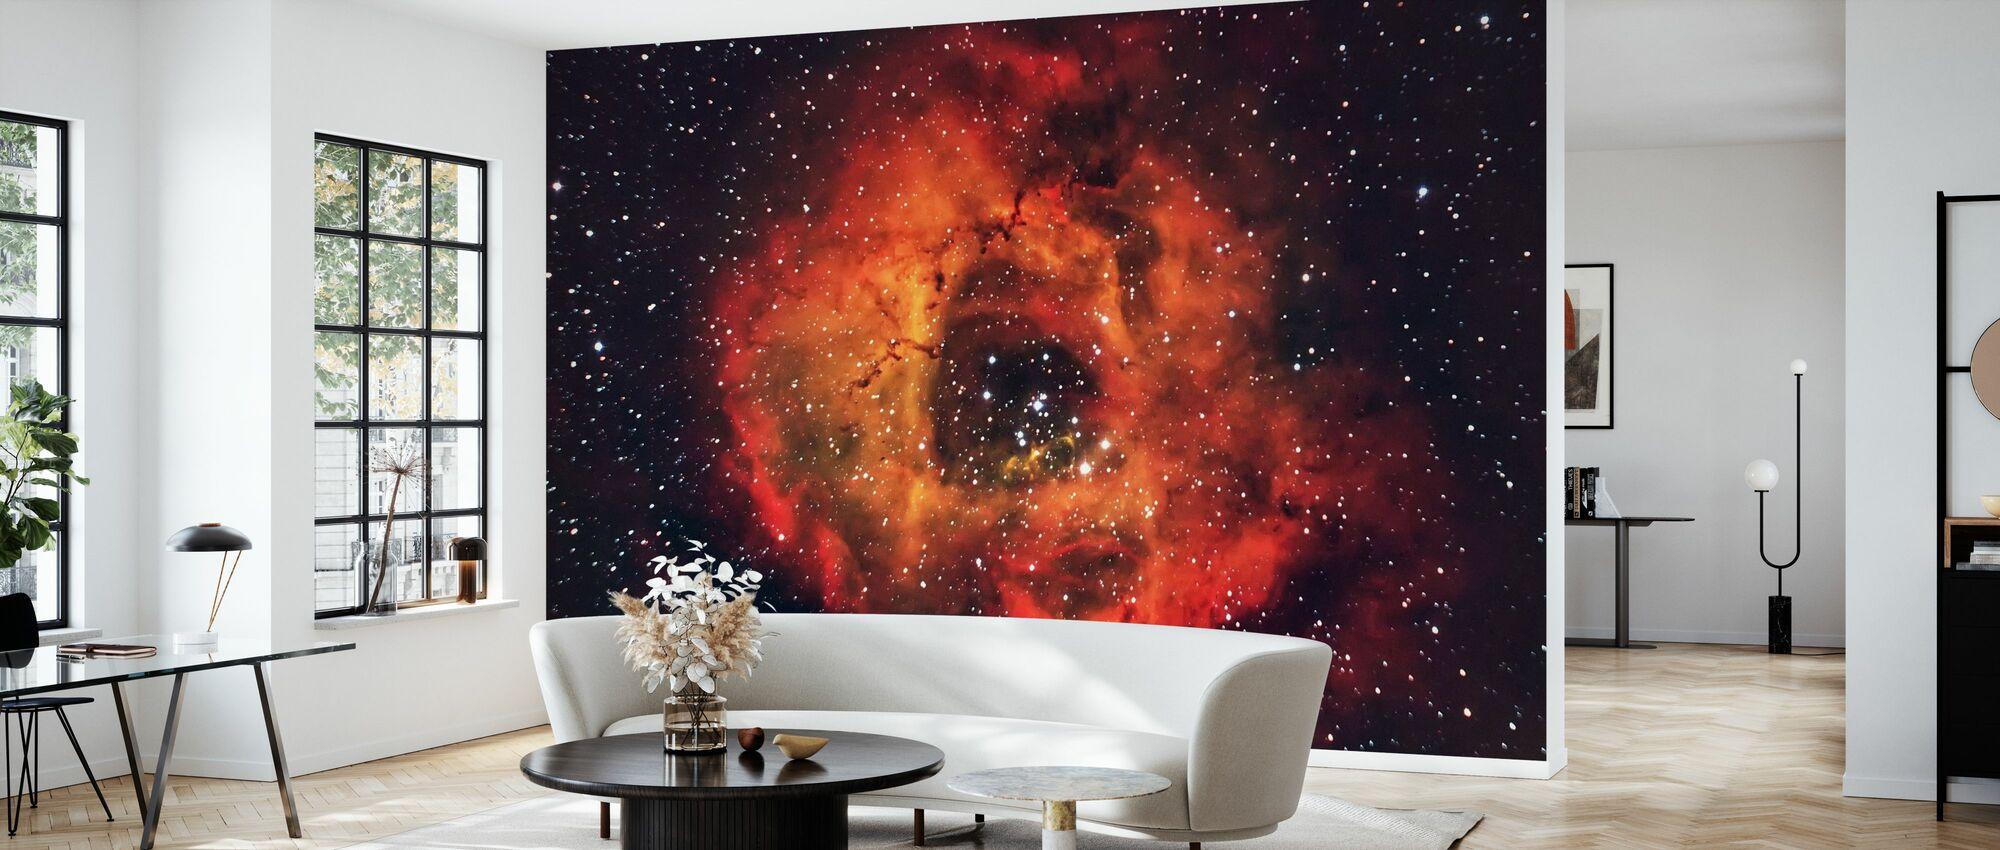 Rose in the Sky - Wallpaper - Living Room